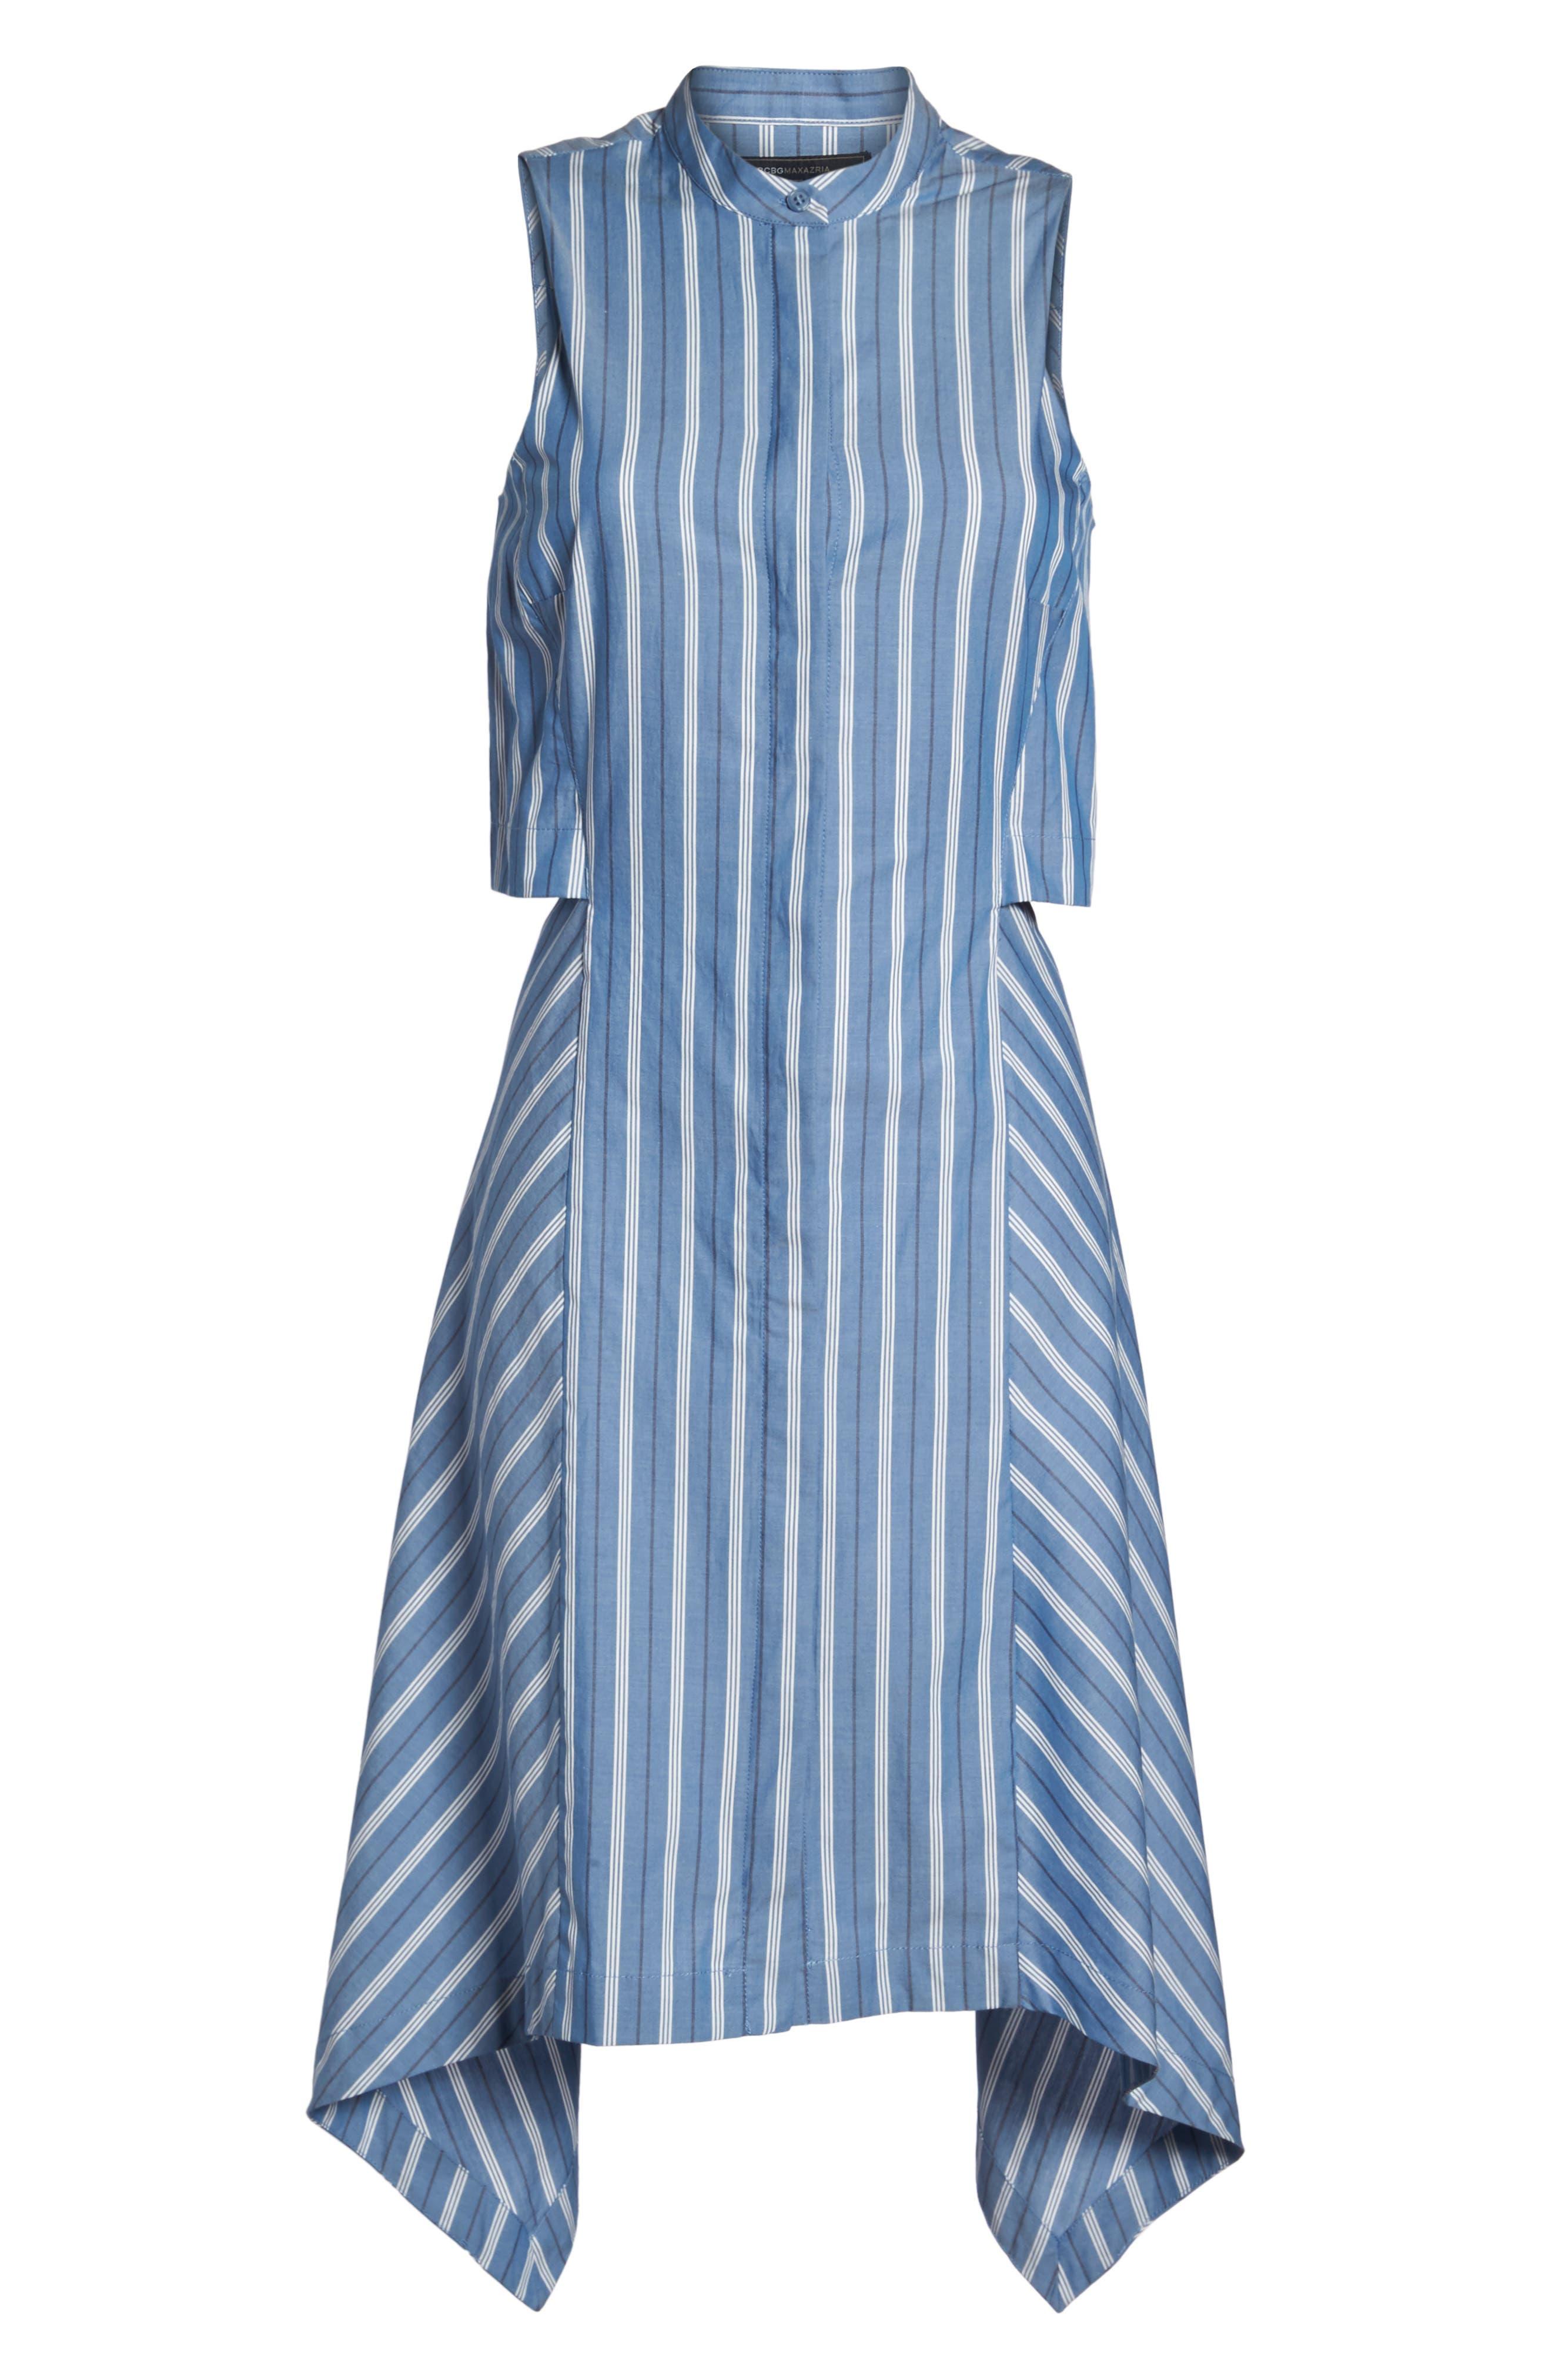 City Sleeveless Dress,                             Alternate thumbnail 6, color,                             404